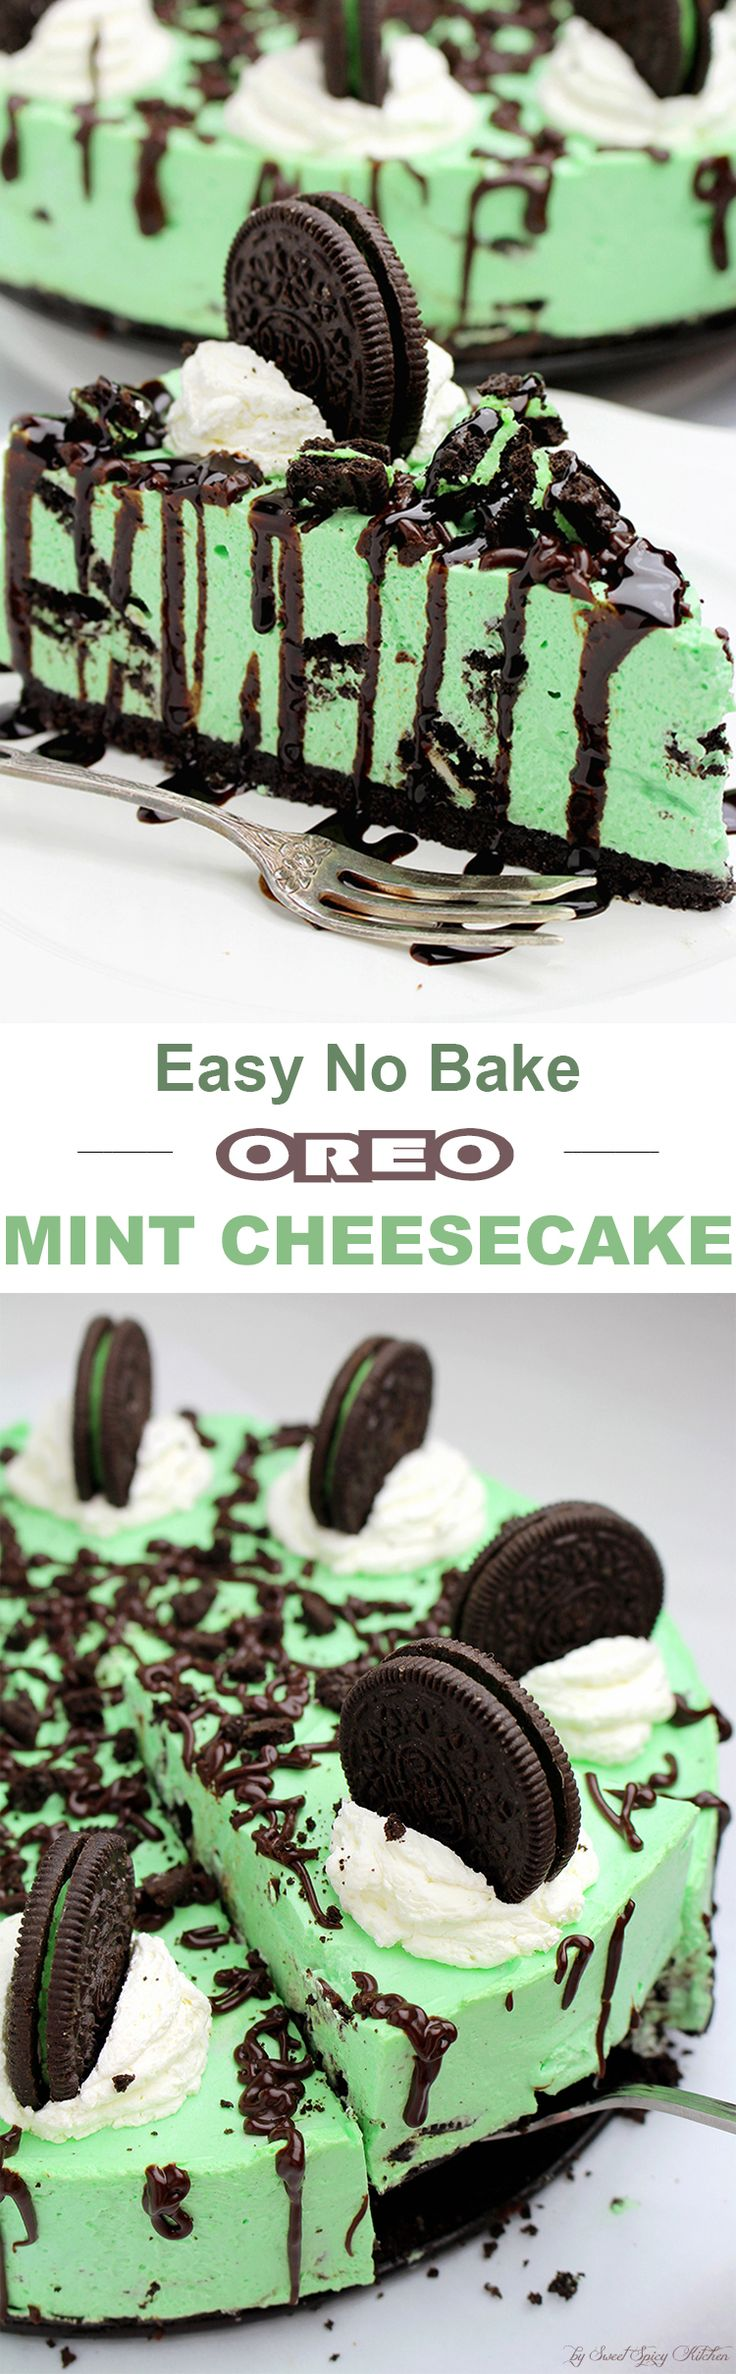 Easy No Bake Oreo Mint Cheesecake